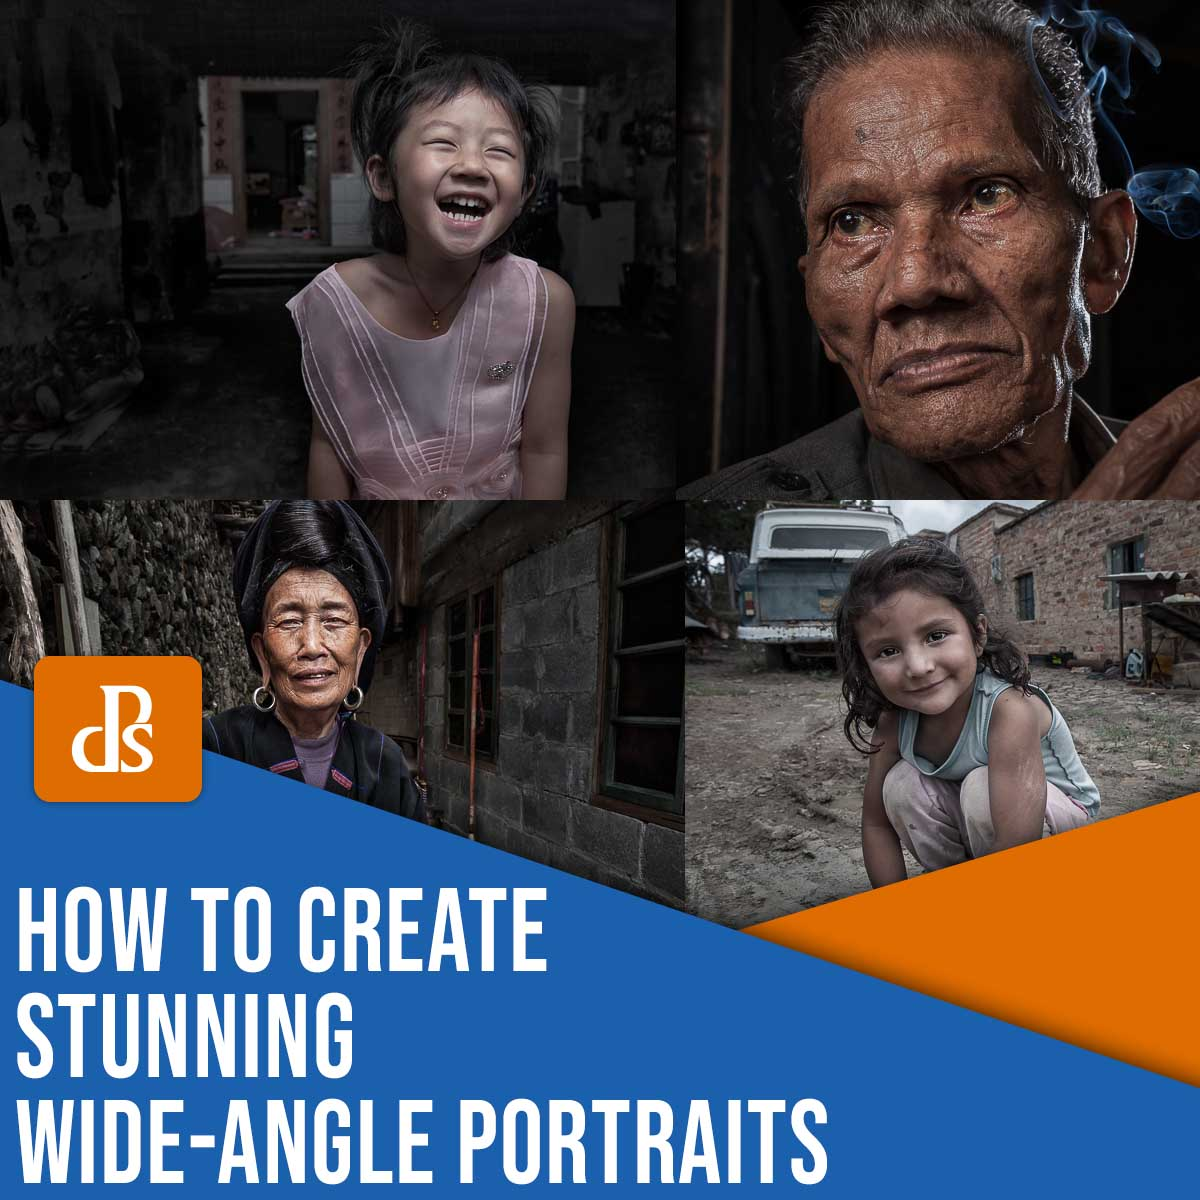 how to create stunning wide-angle portraits